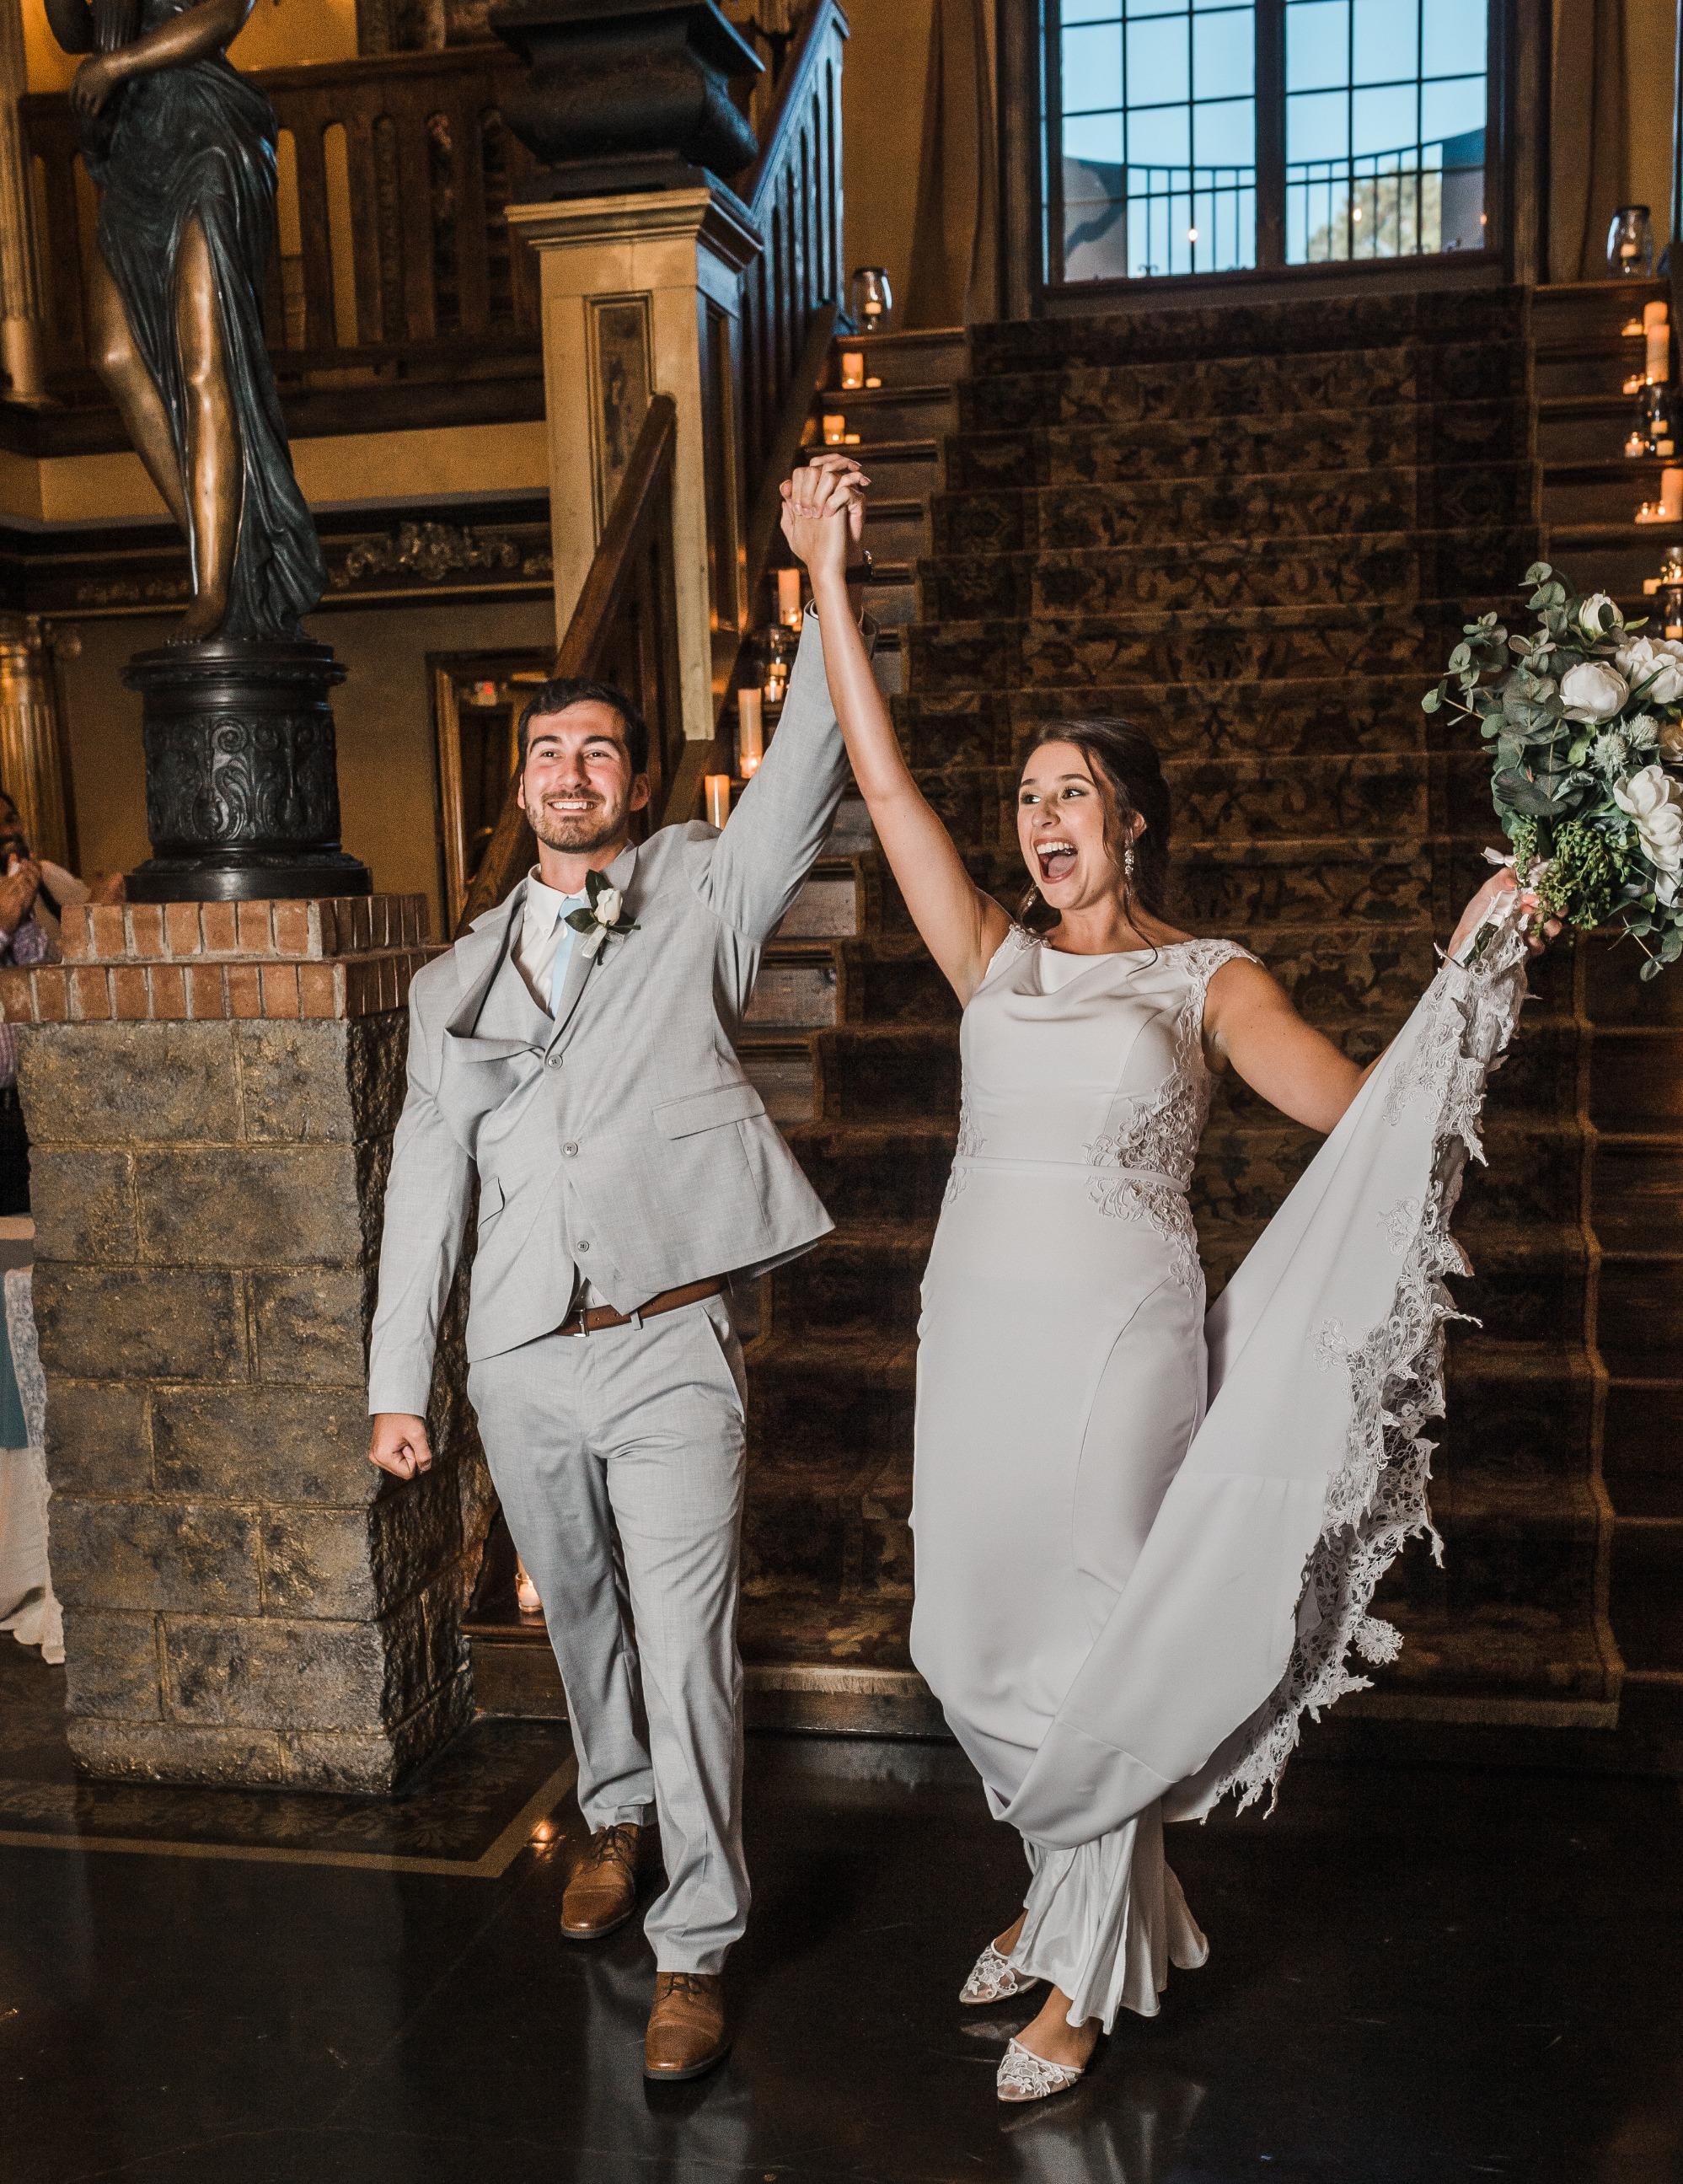 grand entrance into wedding reception, newlywed smile, bride dress, wedding shop